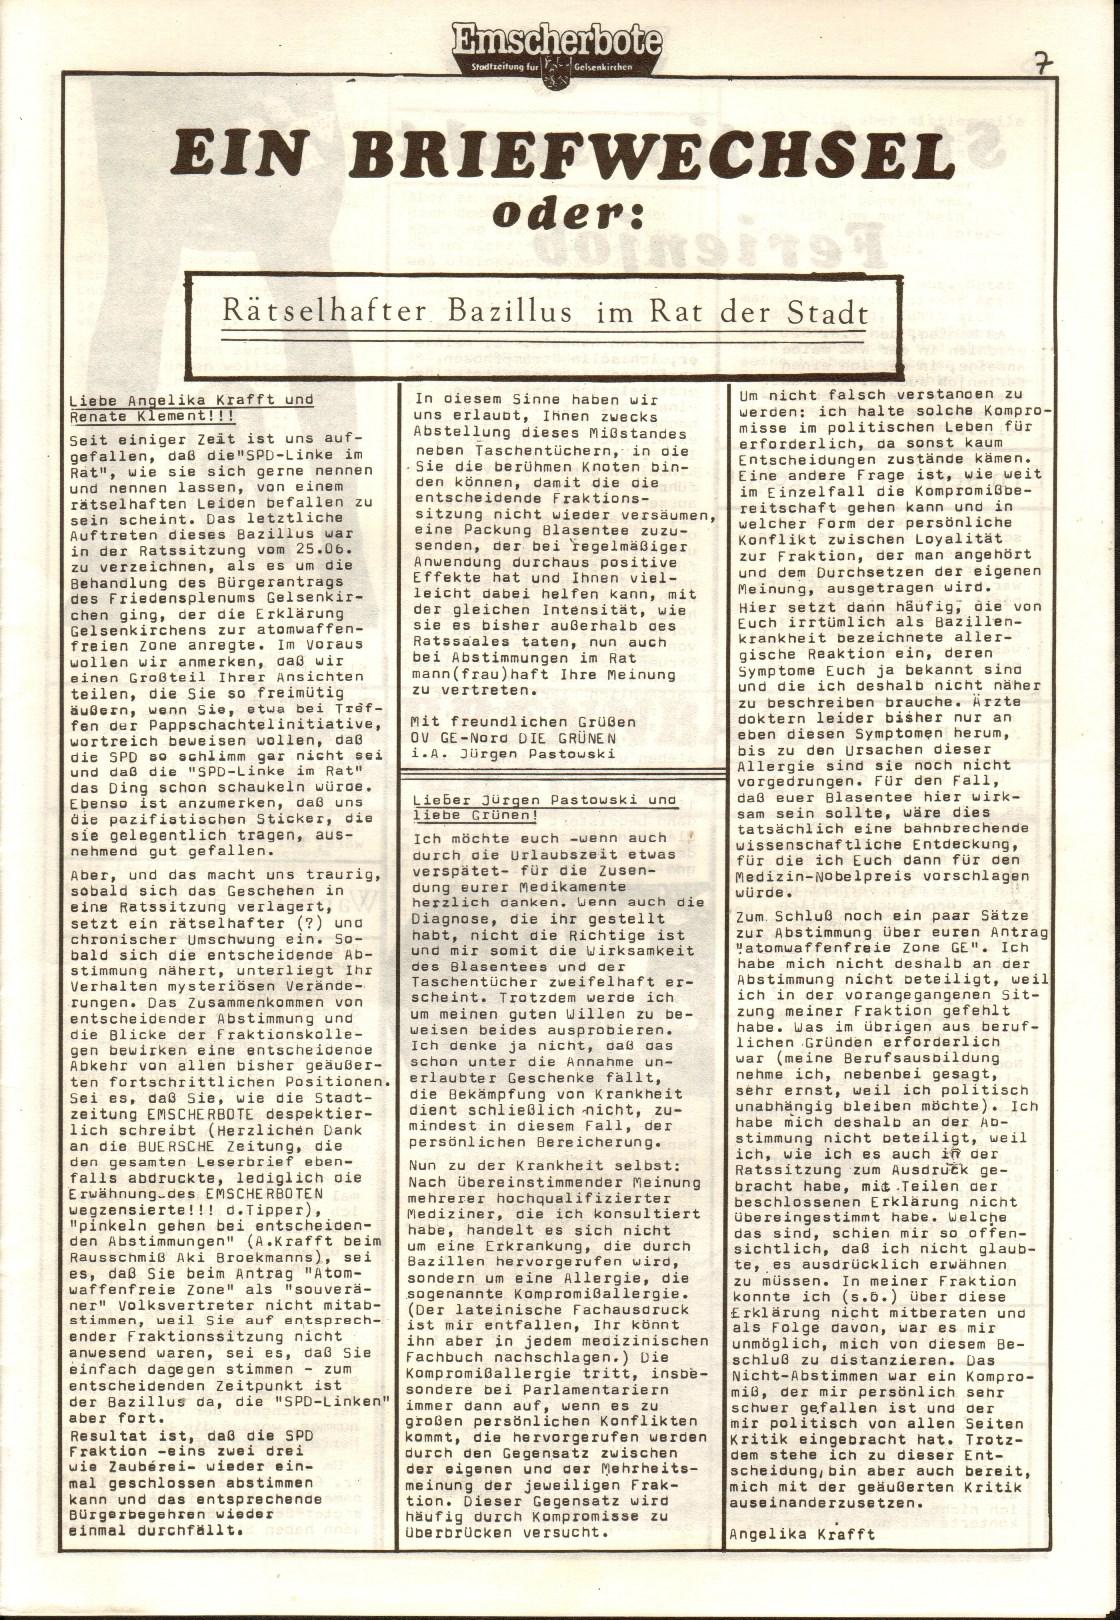 Gelsenkirchen_Emscherbote_1982_20_07